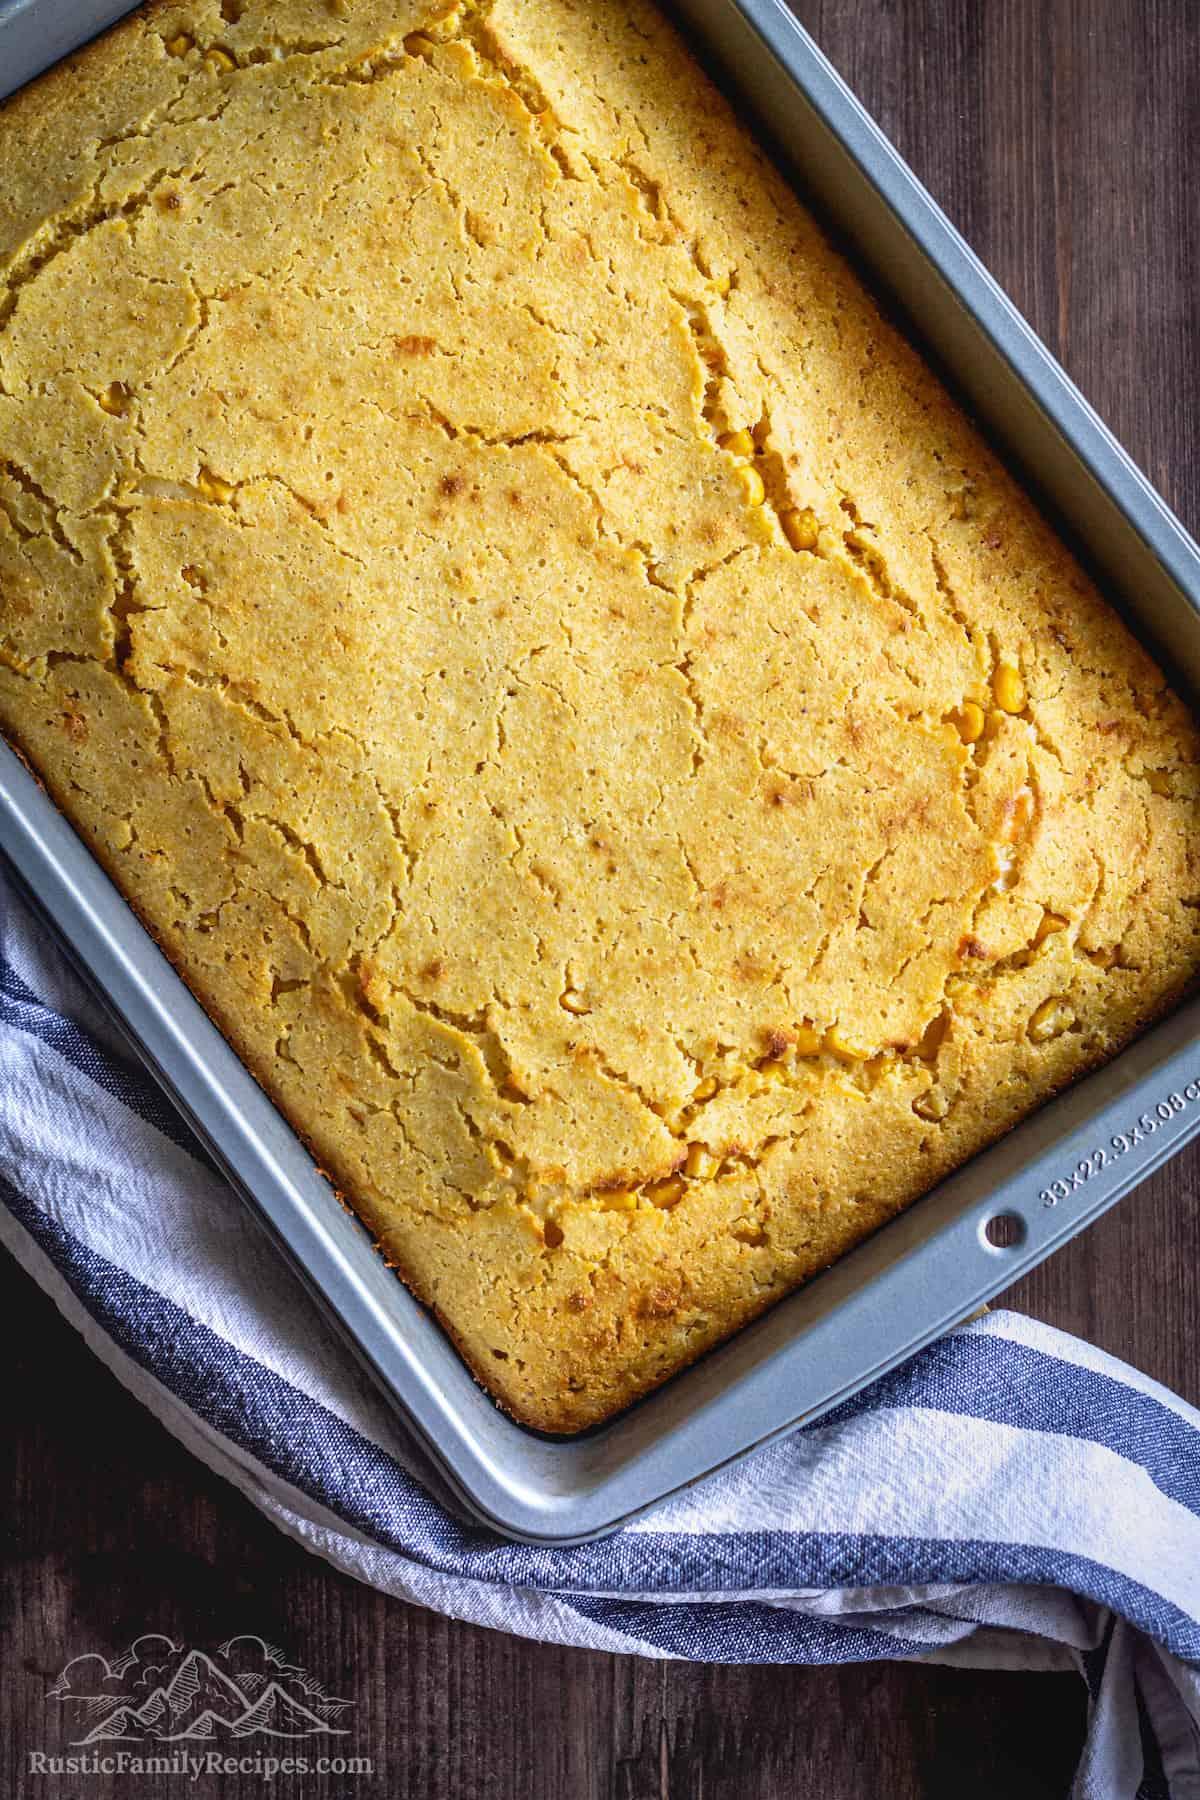 Lightly golden baked Easy Cheddar Cornbread in a baking pan.